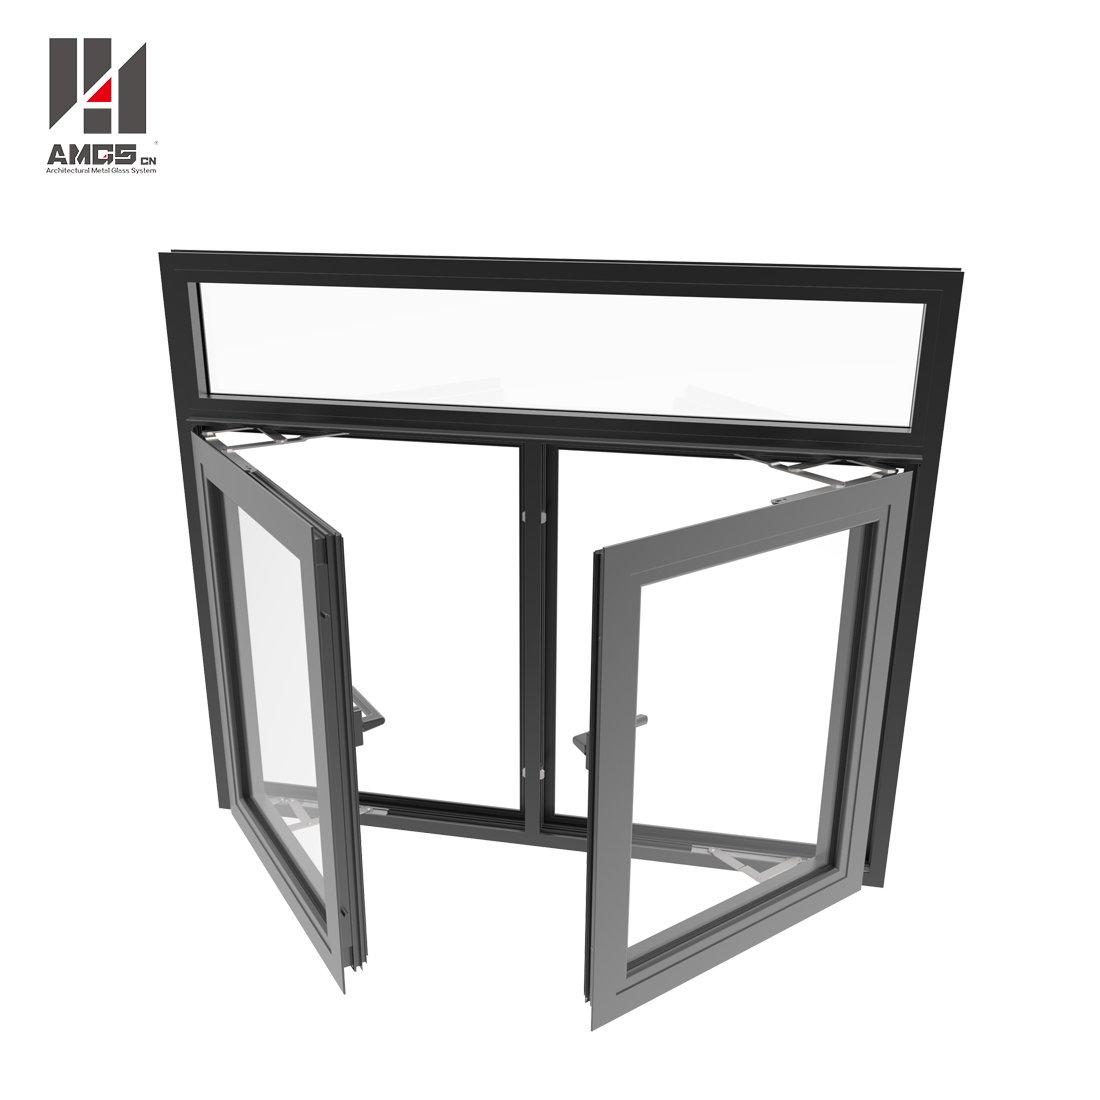 AMGS Commercial Aluminium Windows And Doors In China Aluminum Casement Windows image7